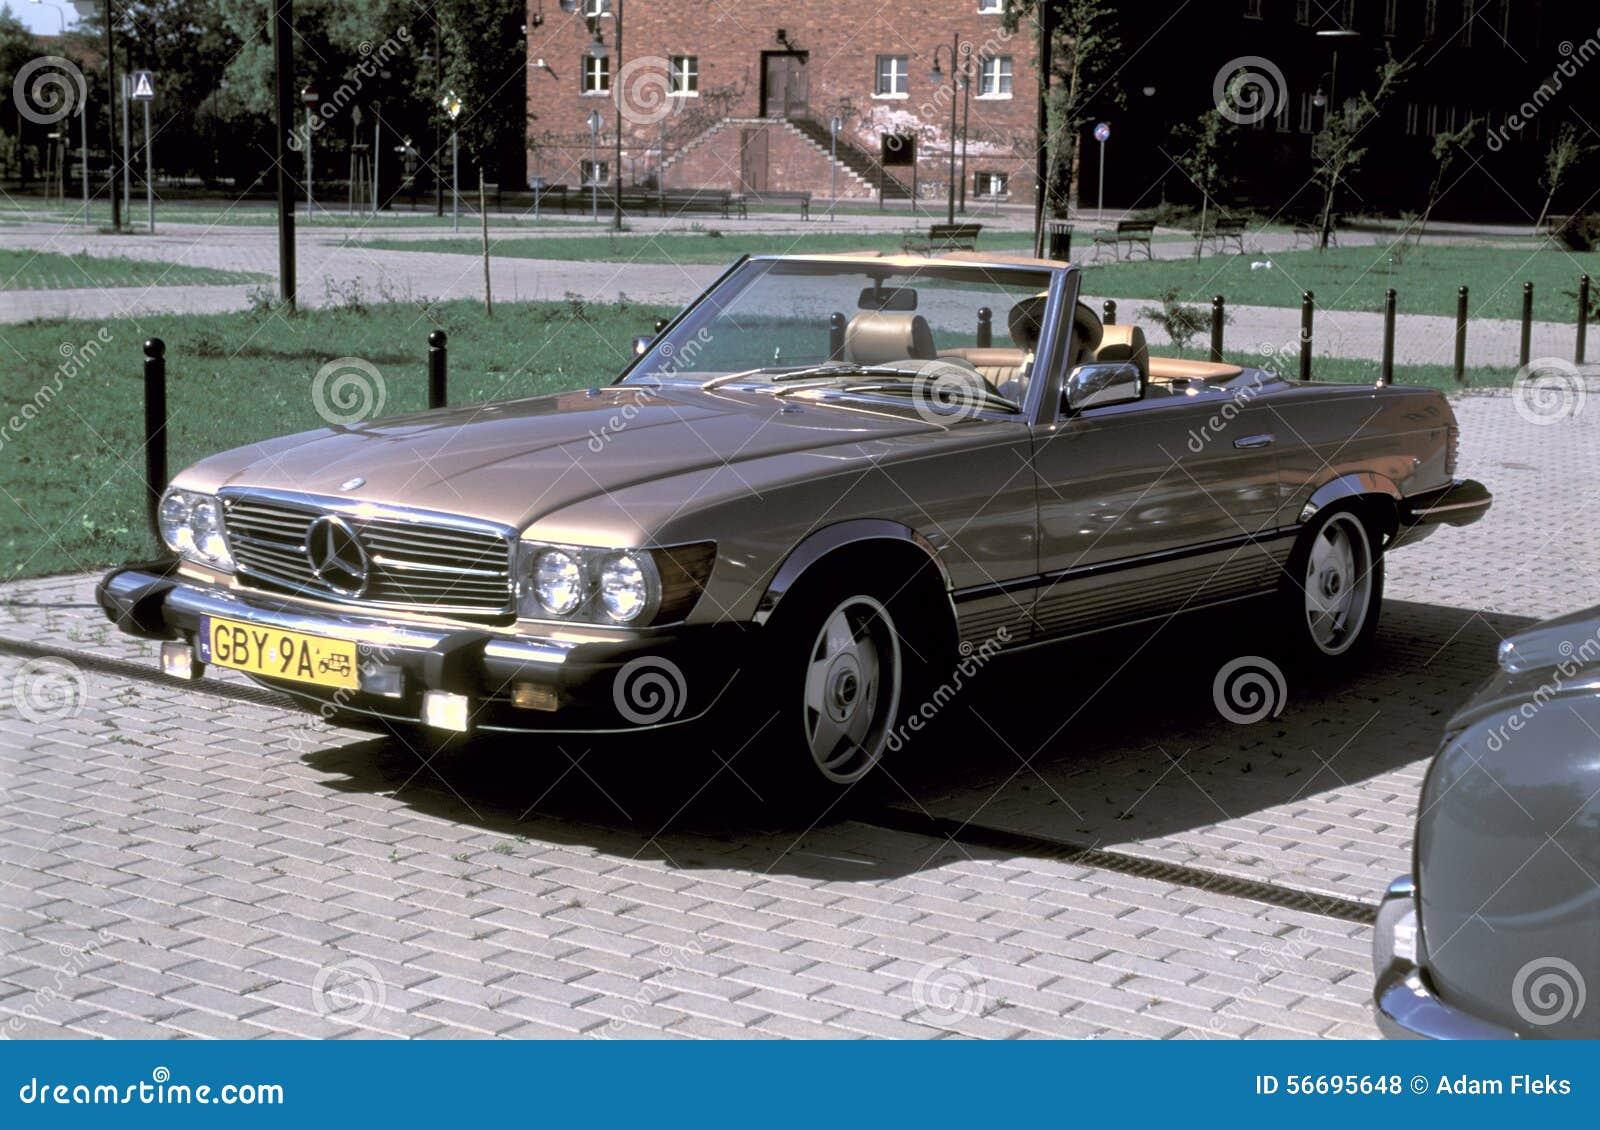 vintage mercedes 380 sl cabrio editorial stock photo. Black Bedroom Furniture Sets. Home Design Ideas